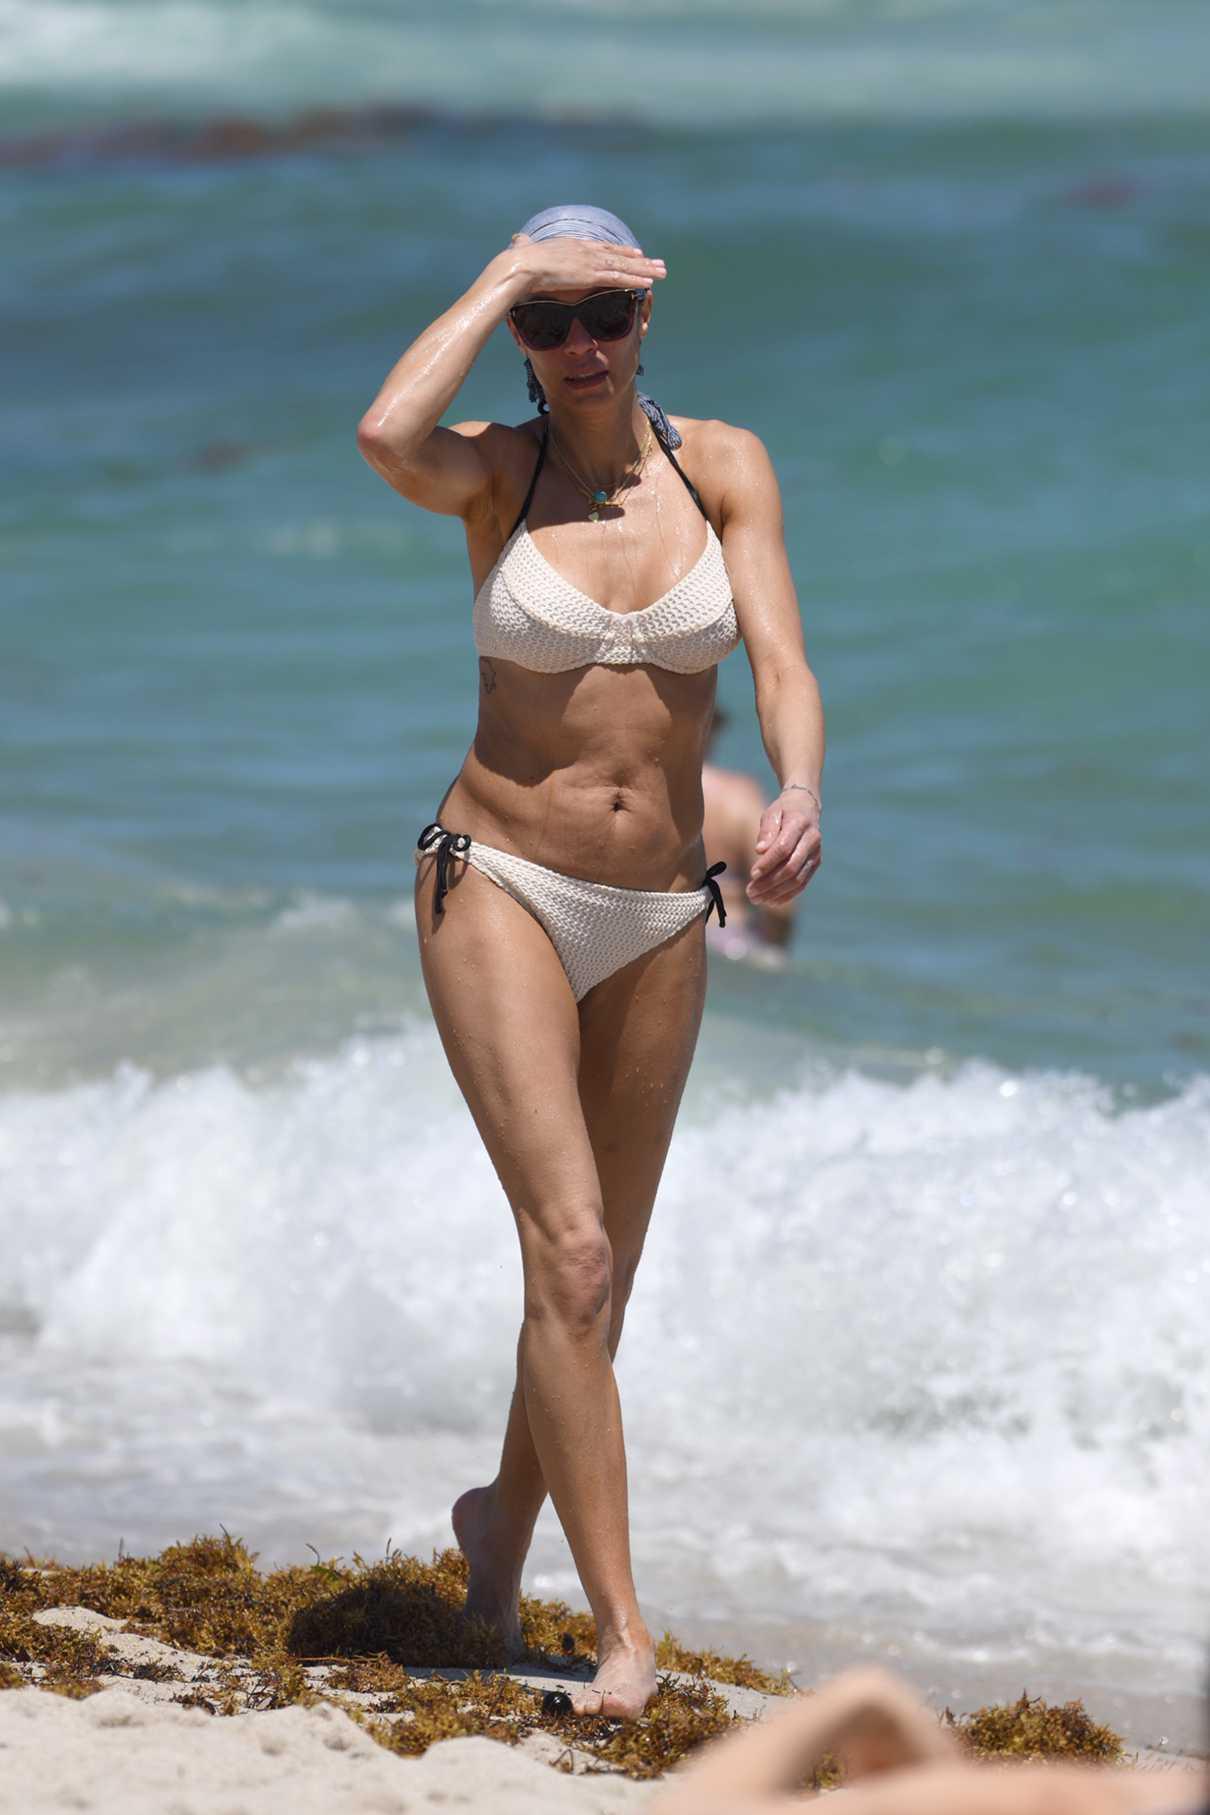 Lilly Becker in a White Bikini